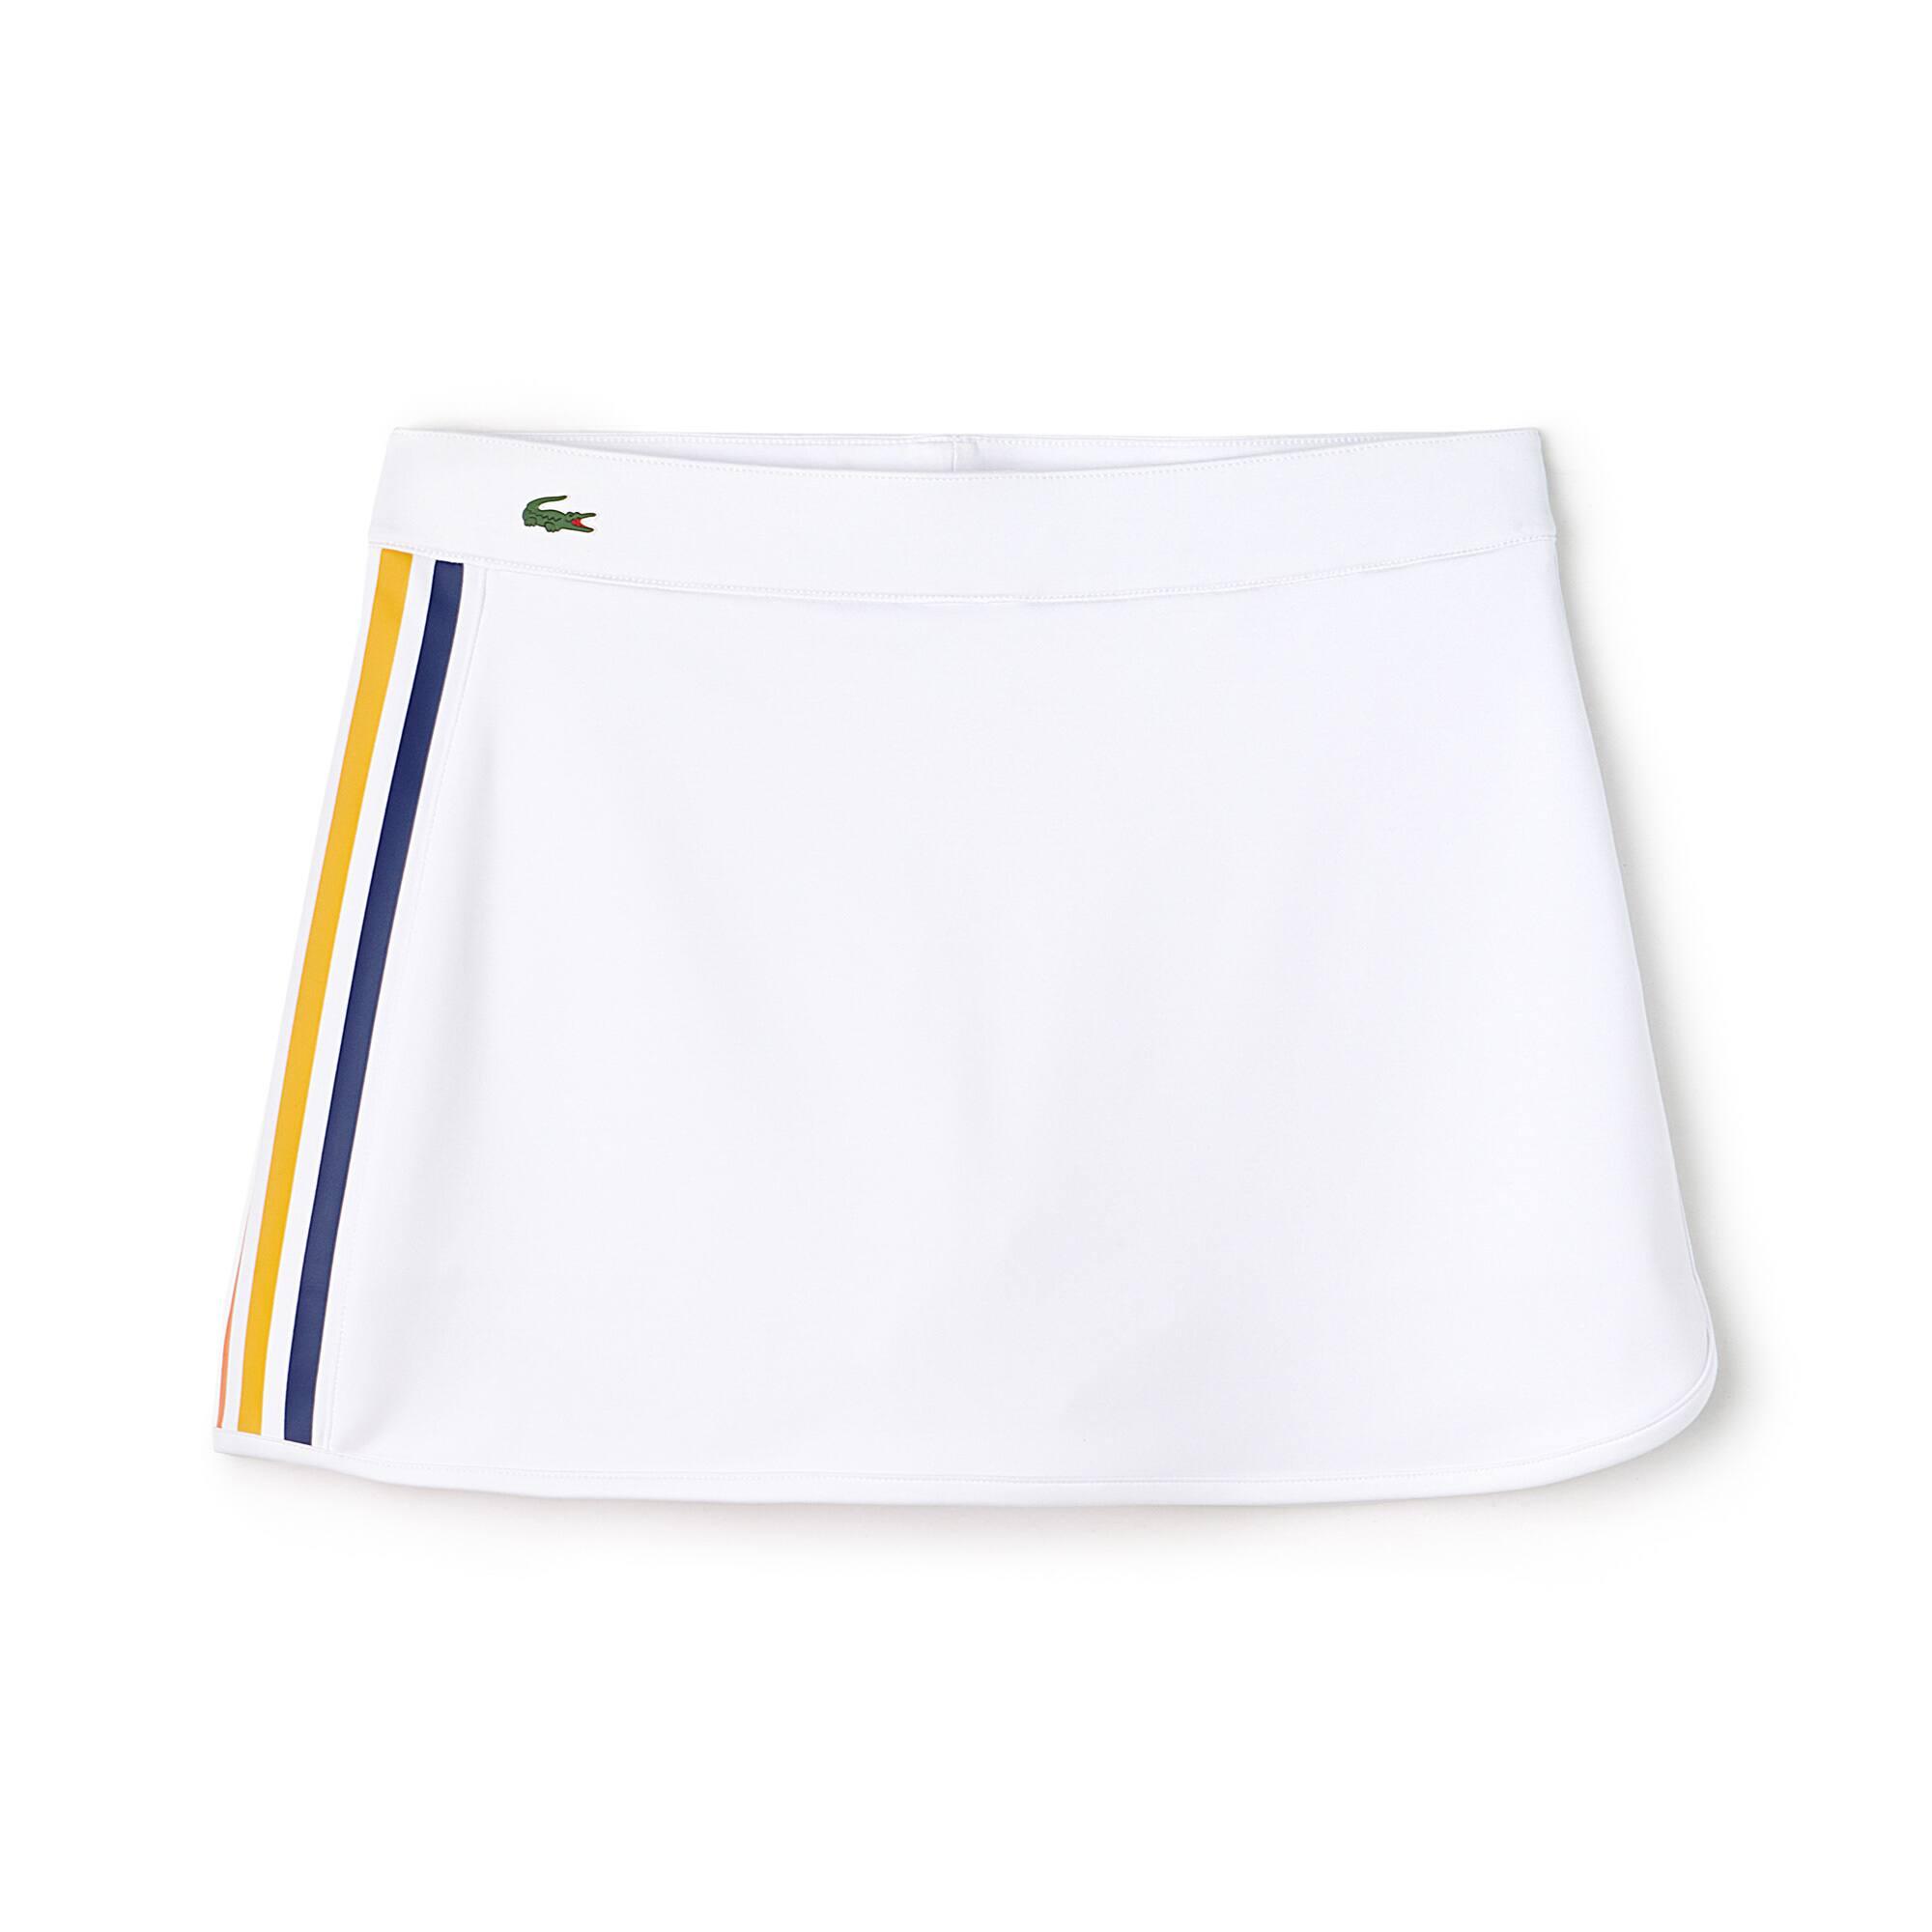 Gonna Tennis Lacoste SPORT in jersey tecnico con fasce a contrasto